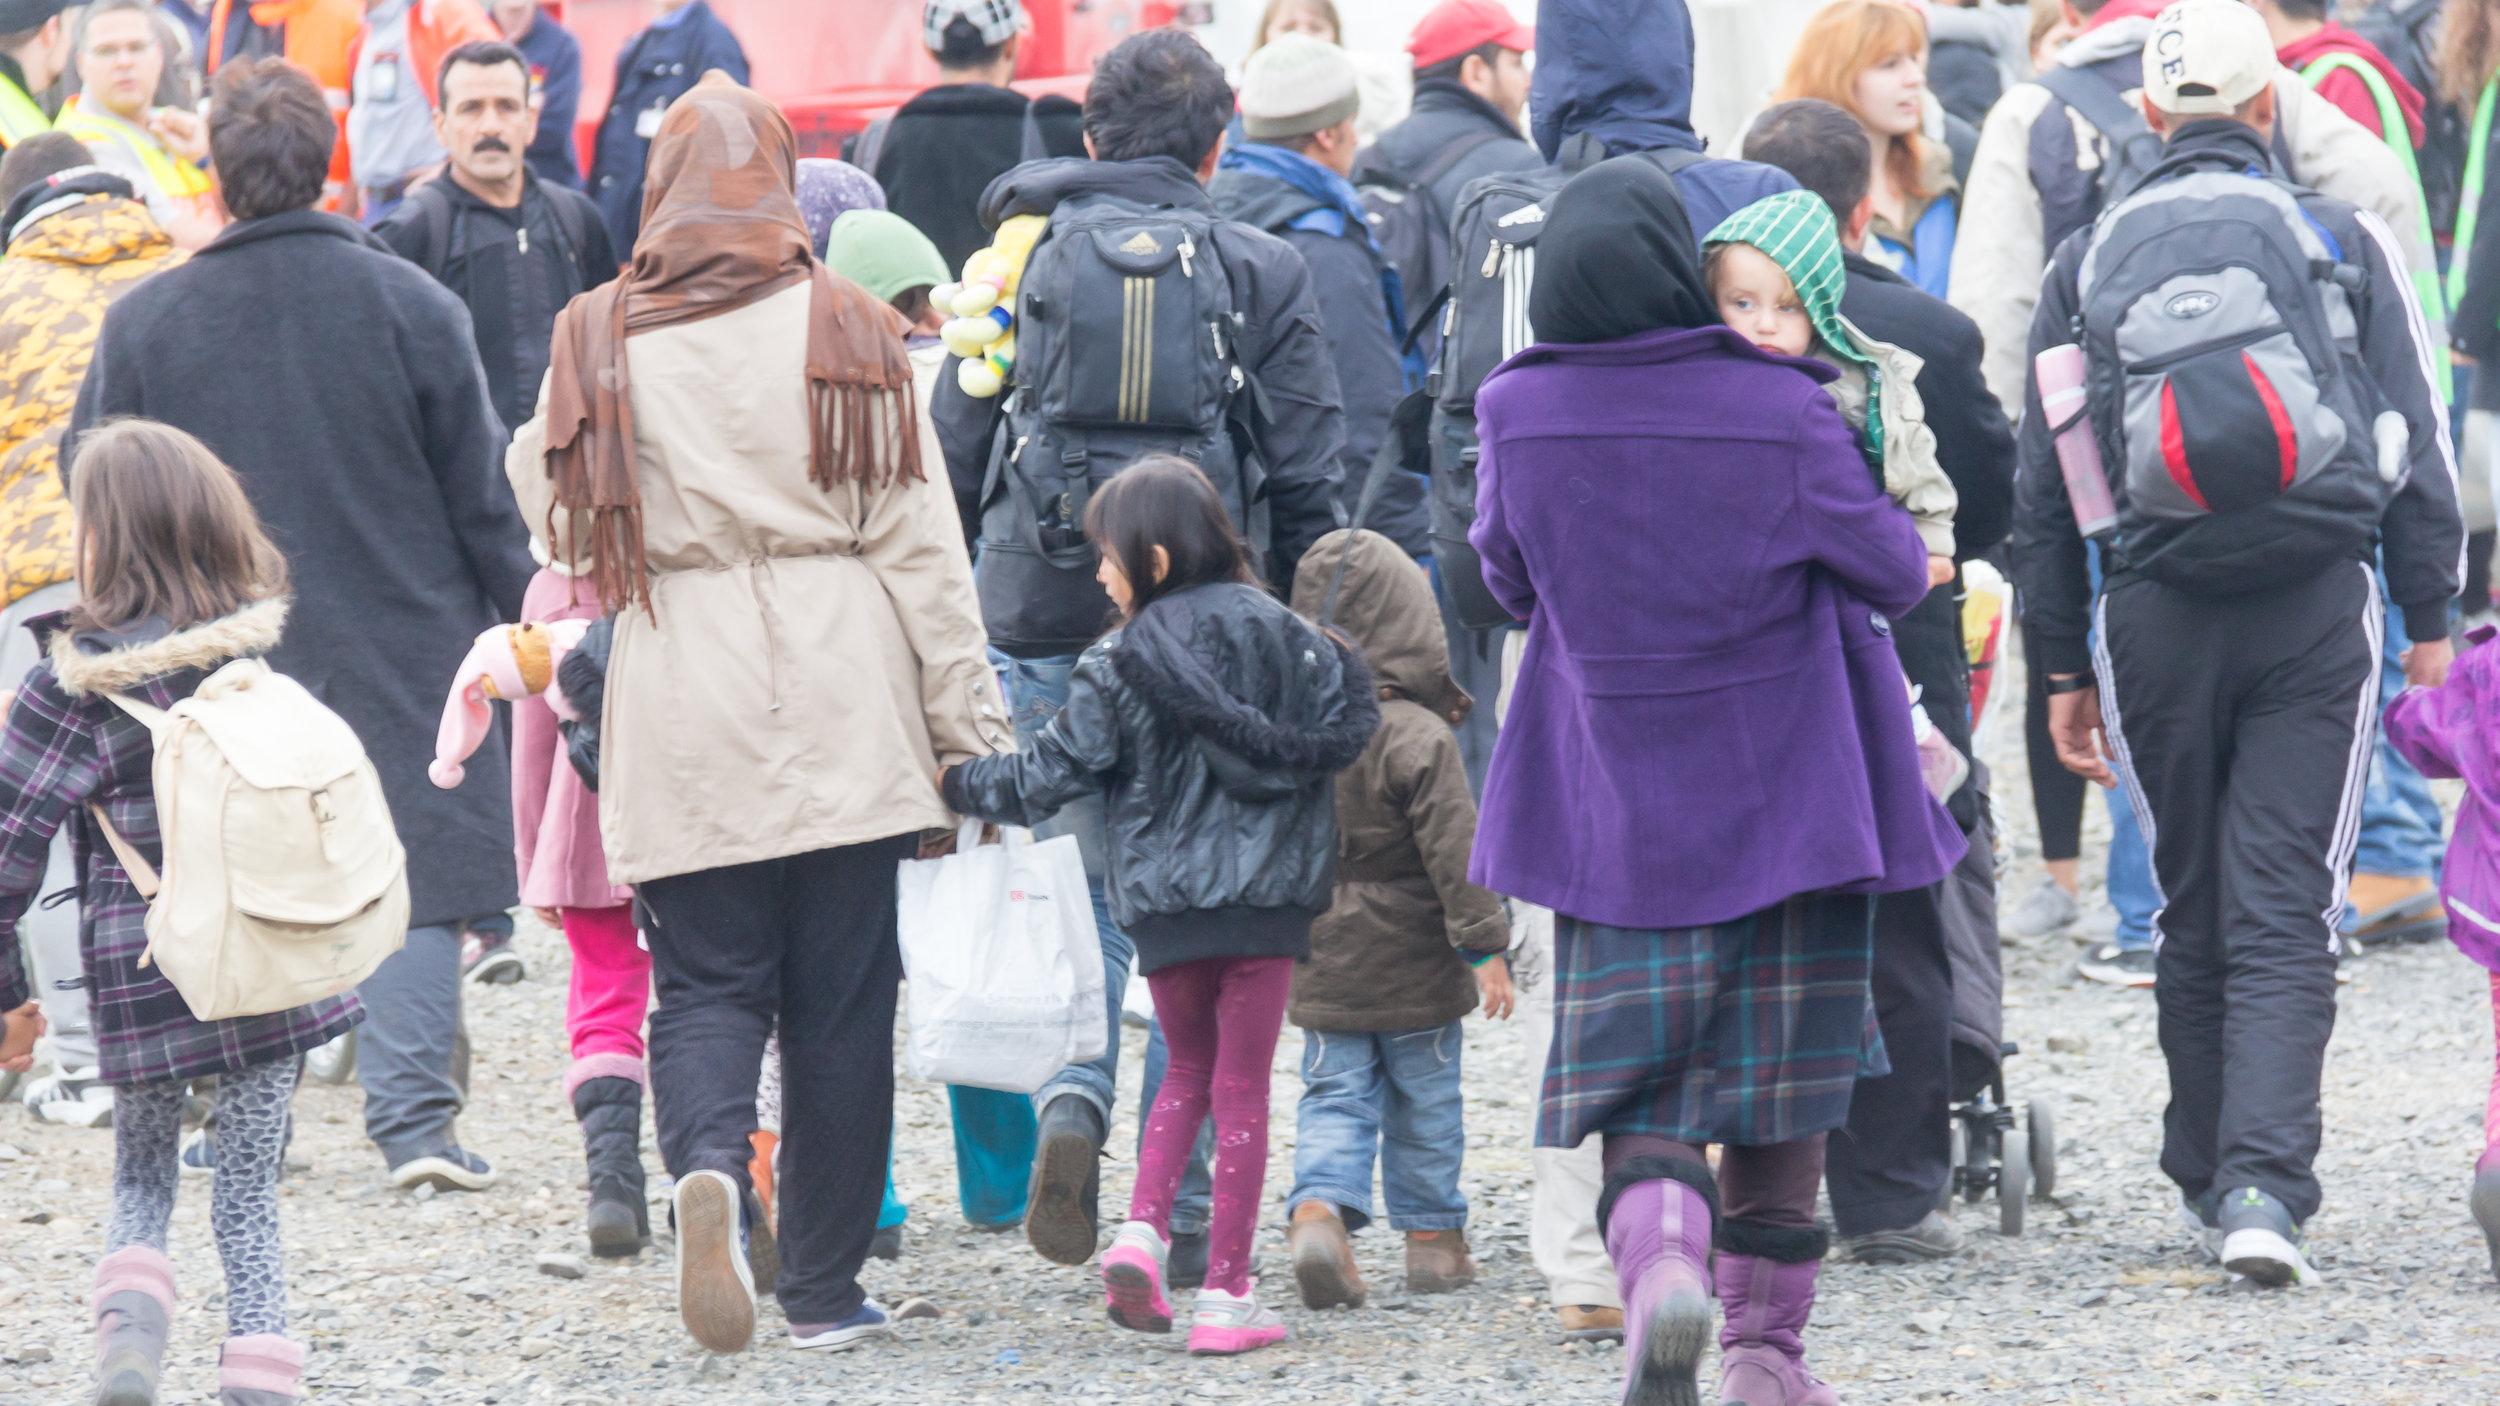 Mideast migrants arrive in Germany in October 2015. Credit: Raimond Spekking via Wikimedia Commons.